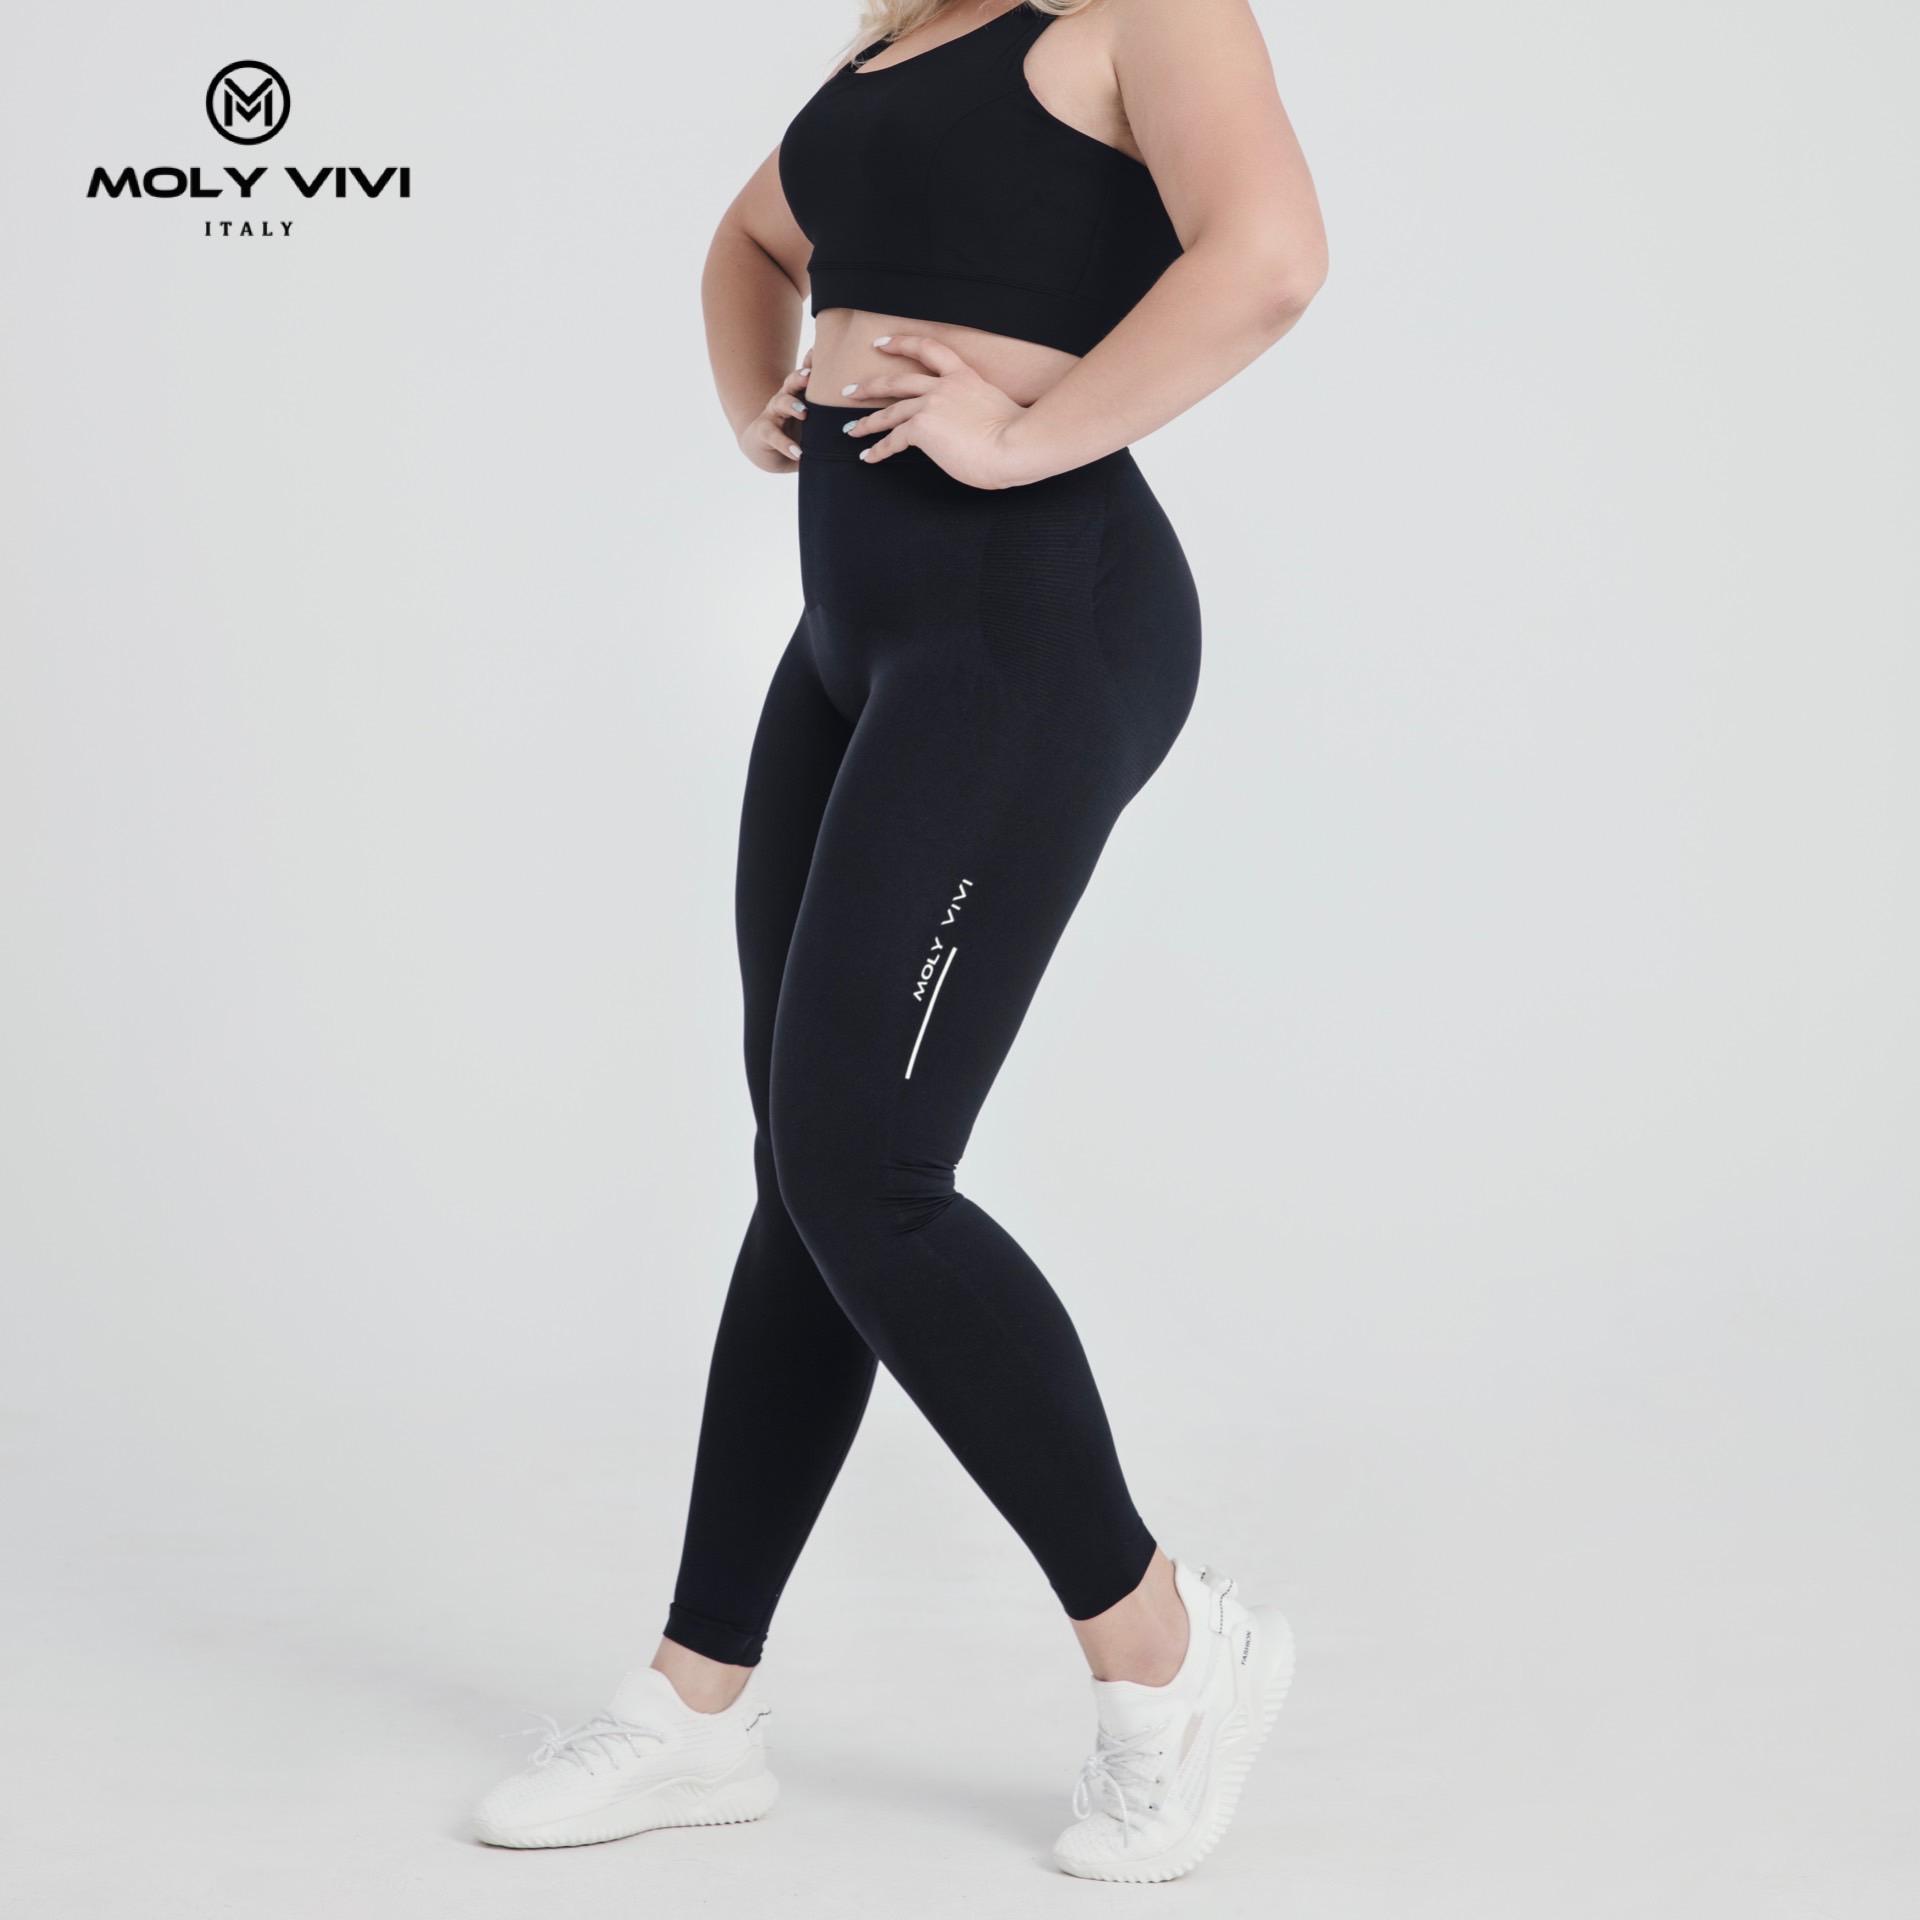 MOLY VIVI 魔力薇薇 夜光魔力裤G2版 塑腿美肤 轻松拥有模特腿 告别小粗腿